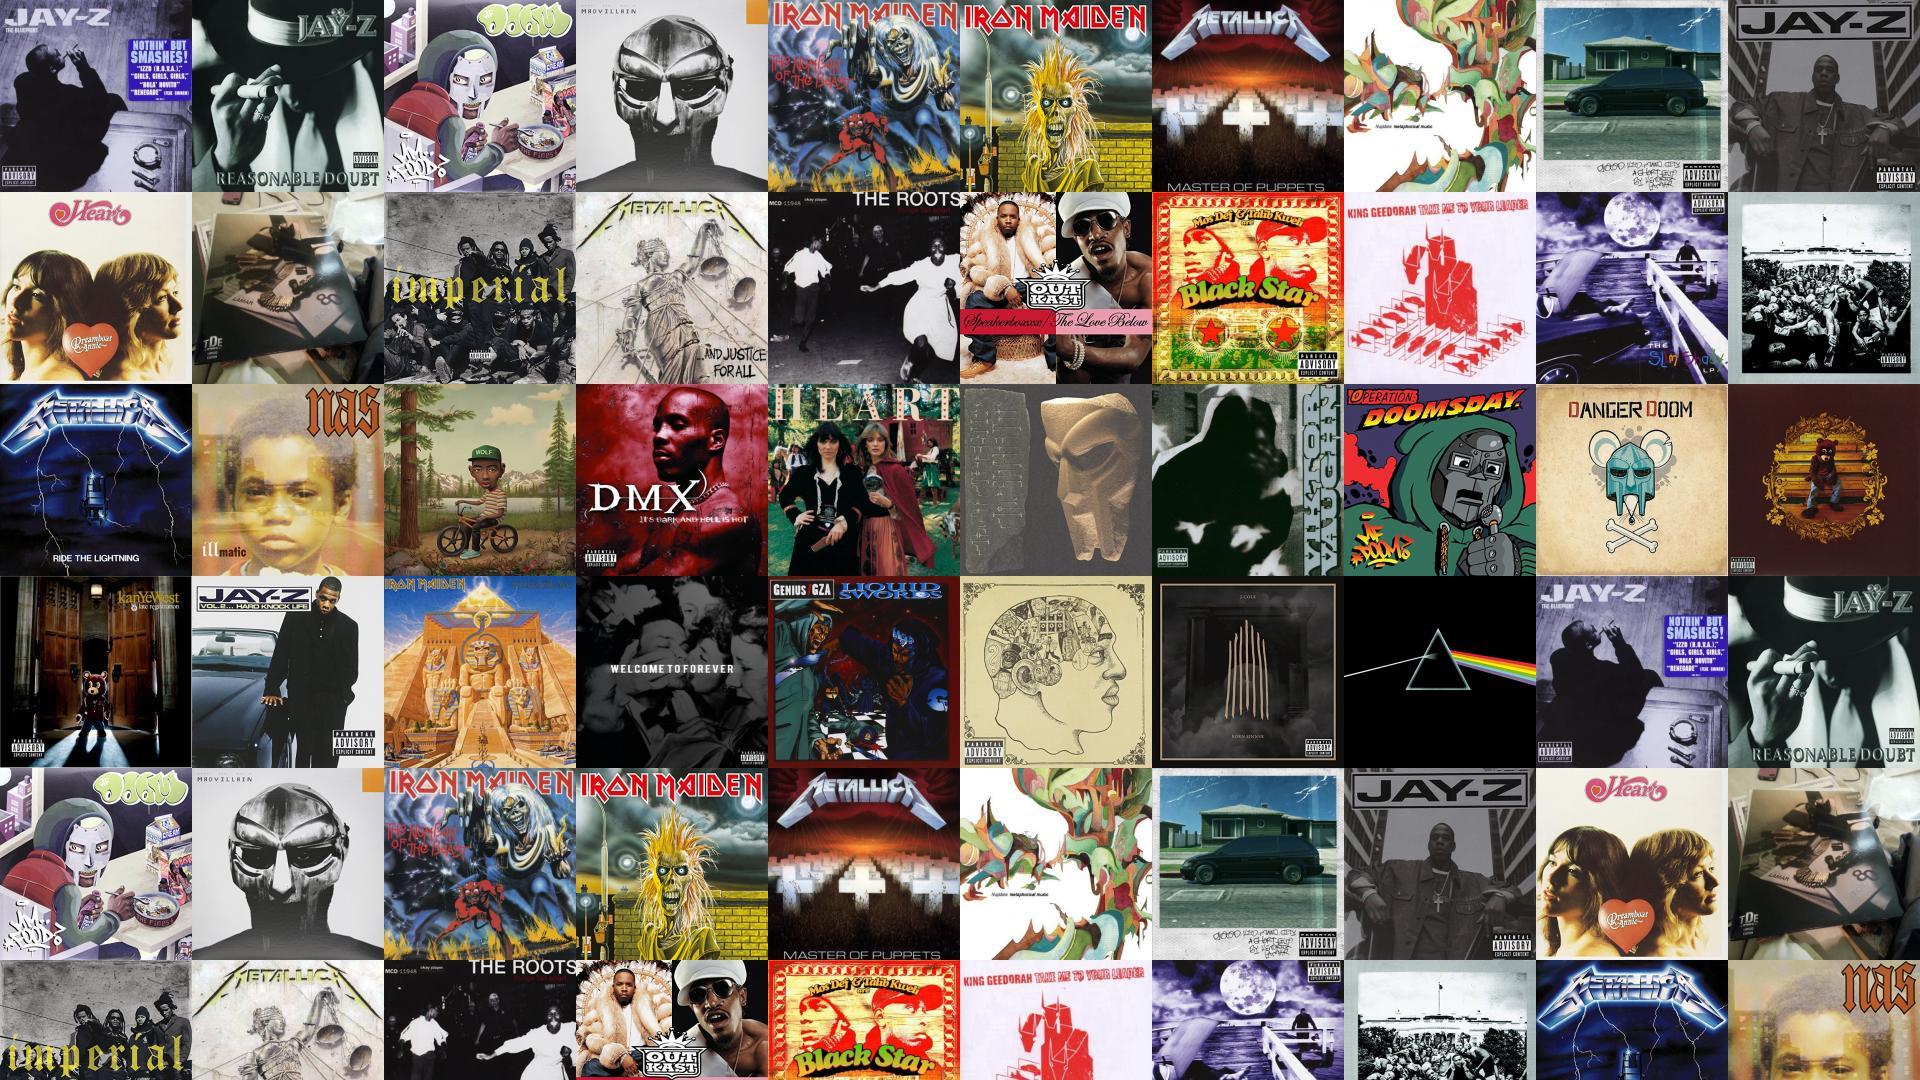 Jay z blueprint reasonable doubt mf doom mm food wallpaper tiled download tweak this malvernweather Image collections